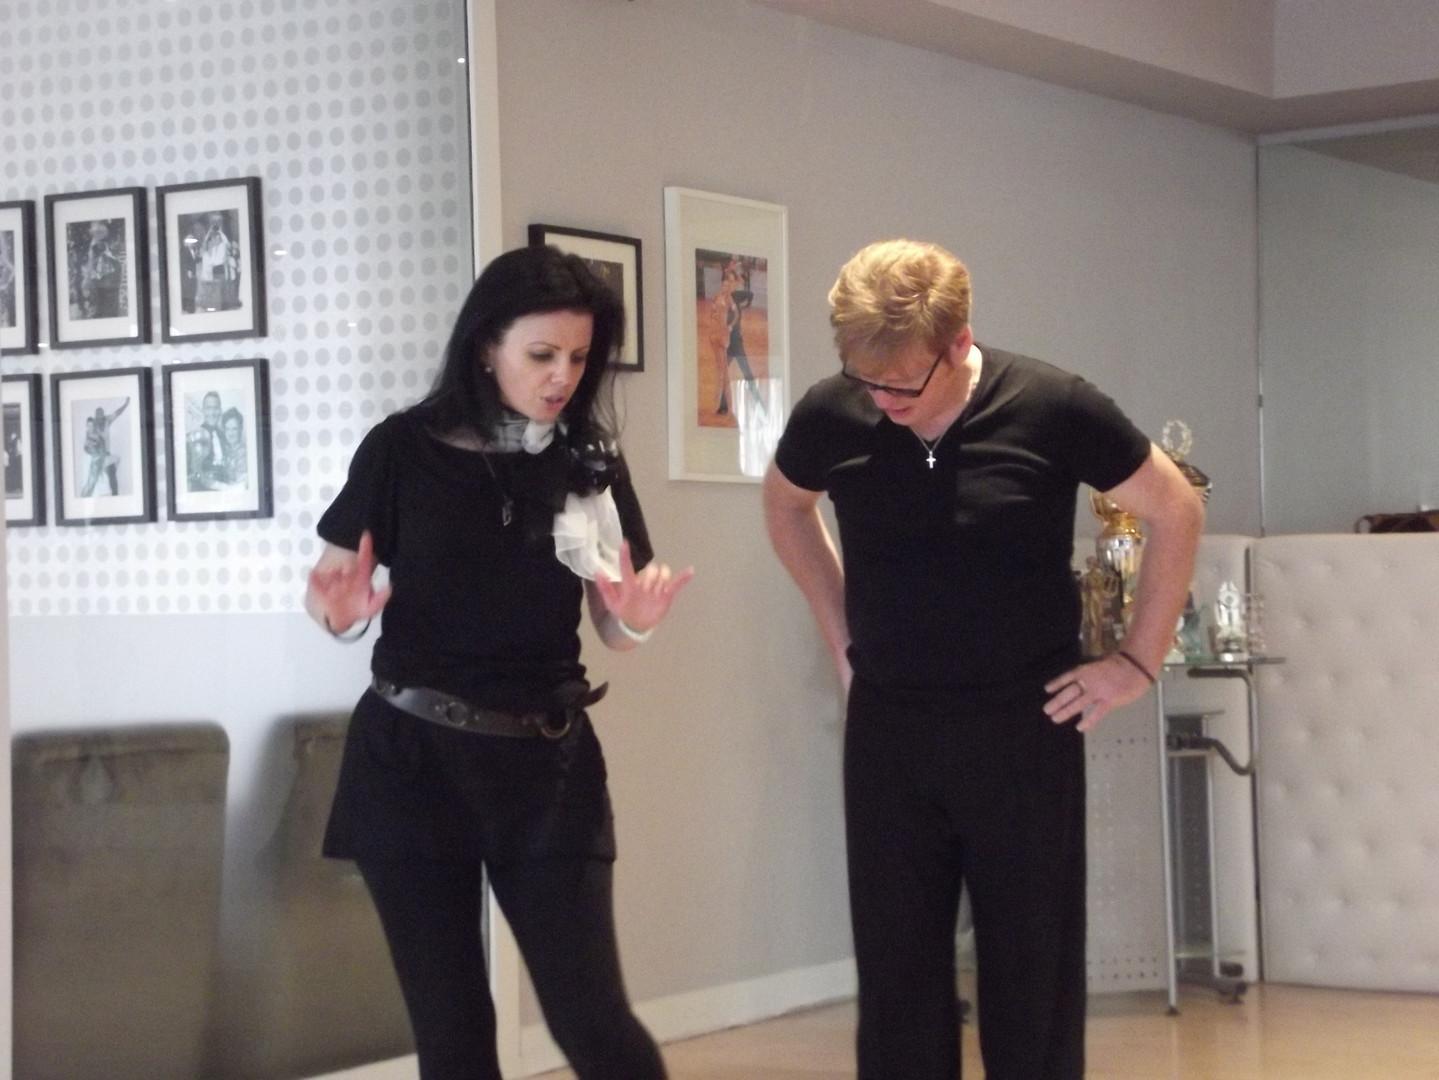 Jive Waltz Cha-Cha Karen Brady and Jack Murphy